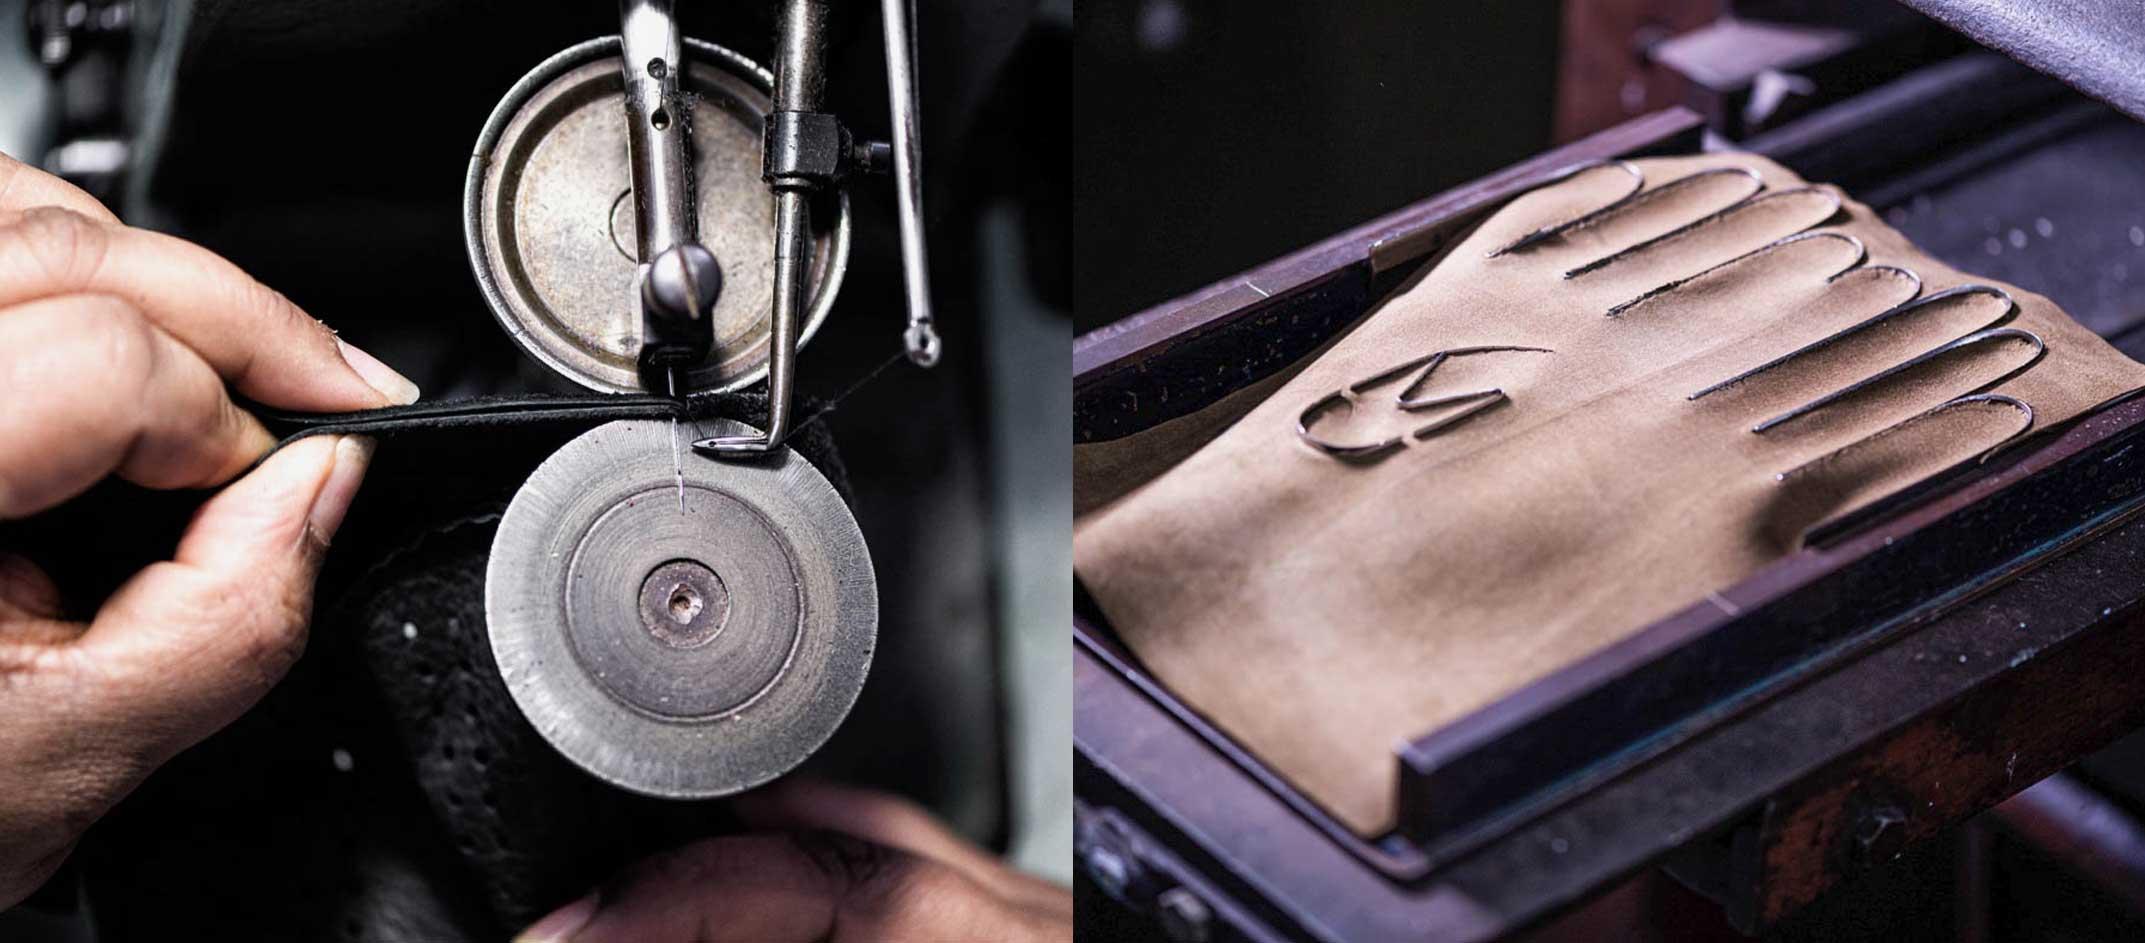 Unsere Handschuh Manufaktur